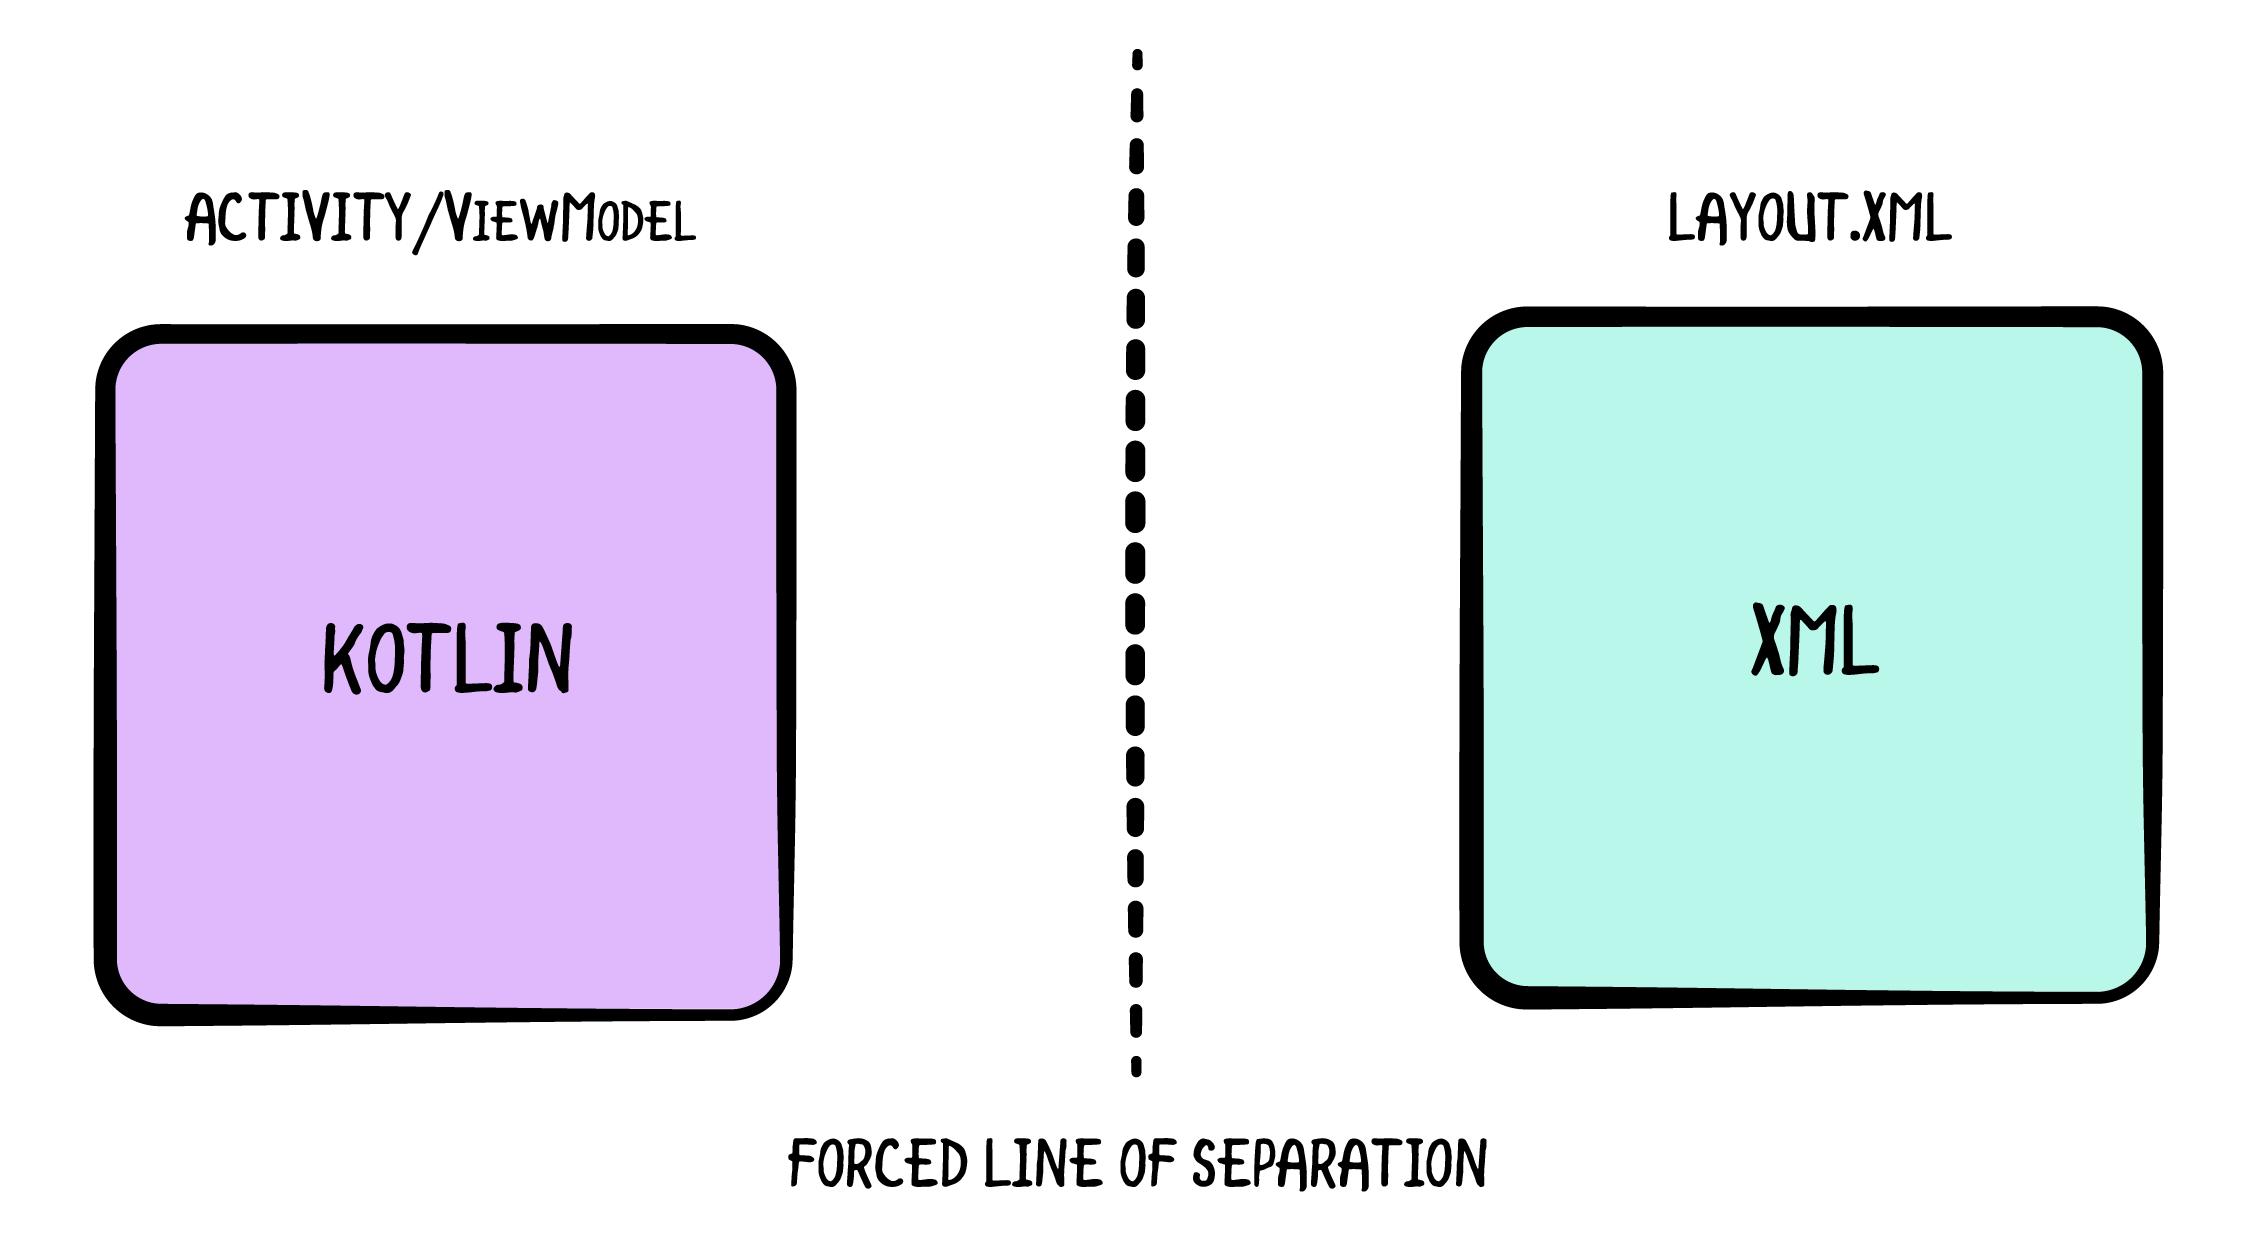 Forced line of separation of concerns